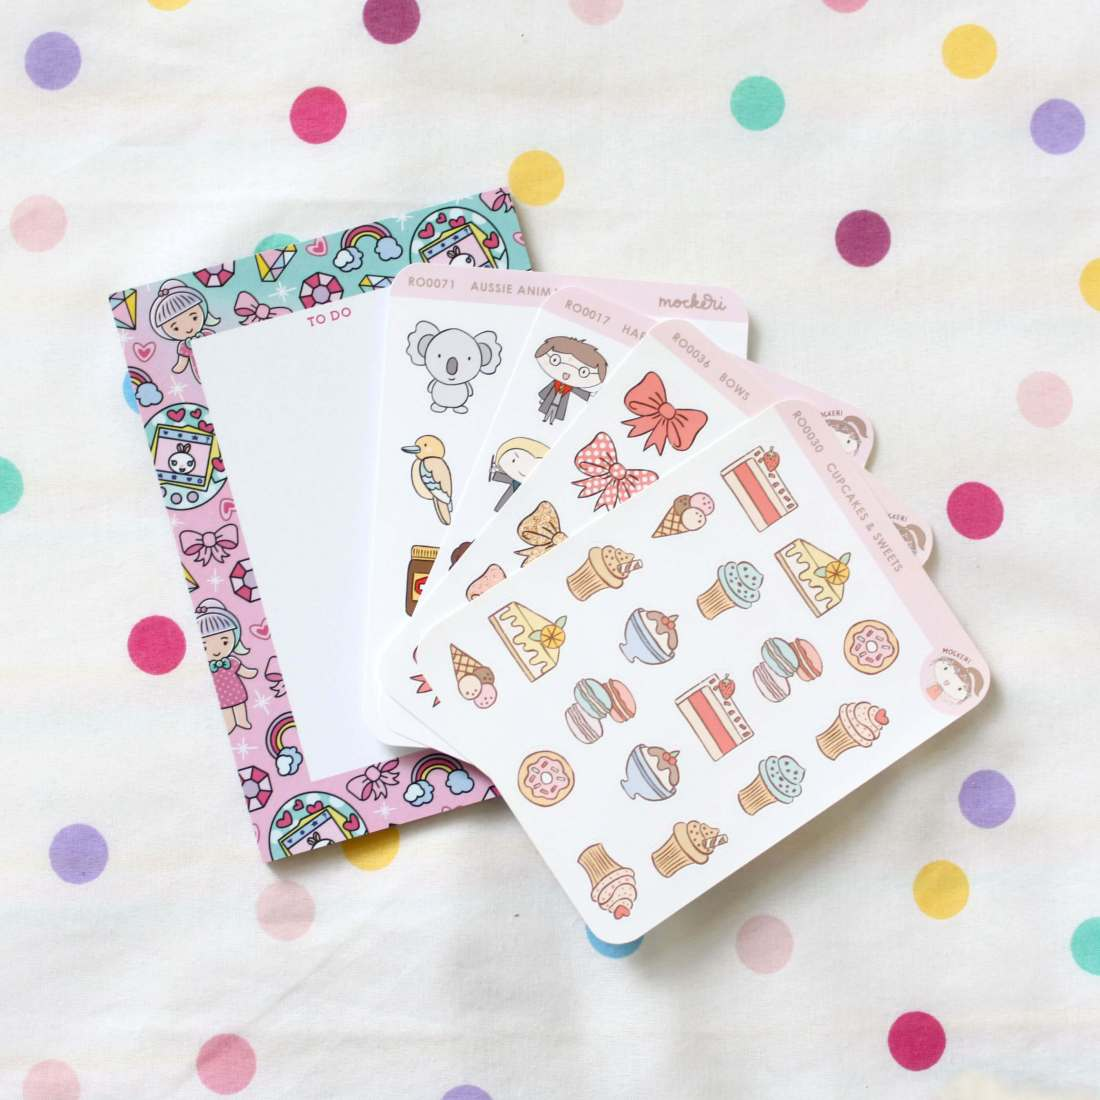 Sticker set and note pad by Mockeri